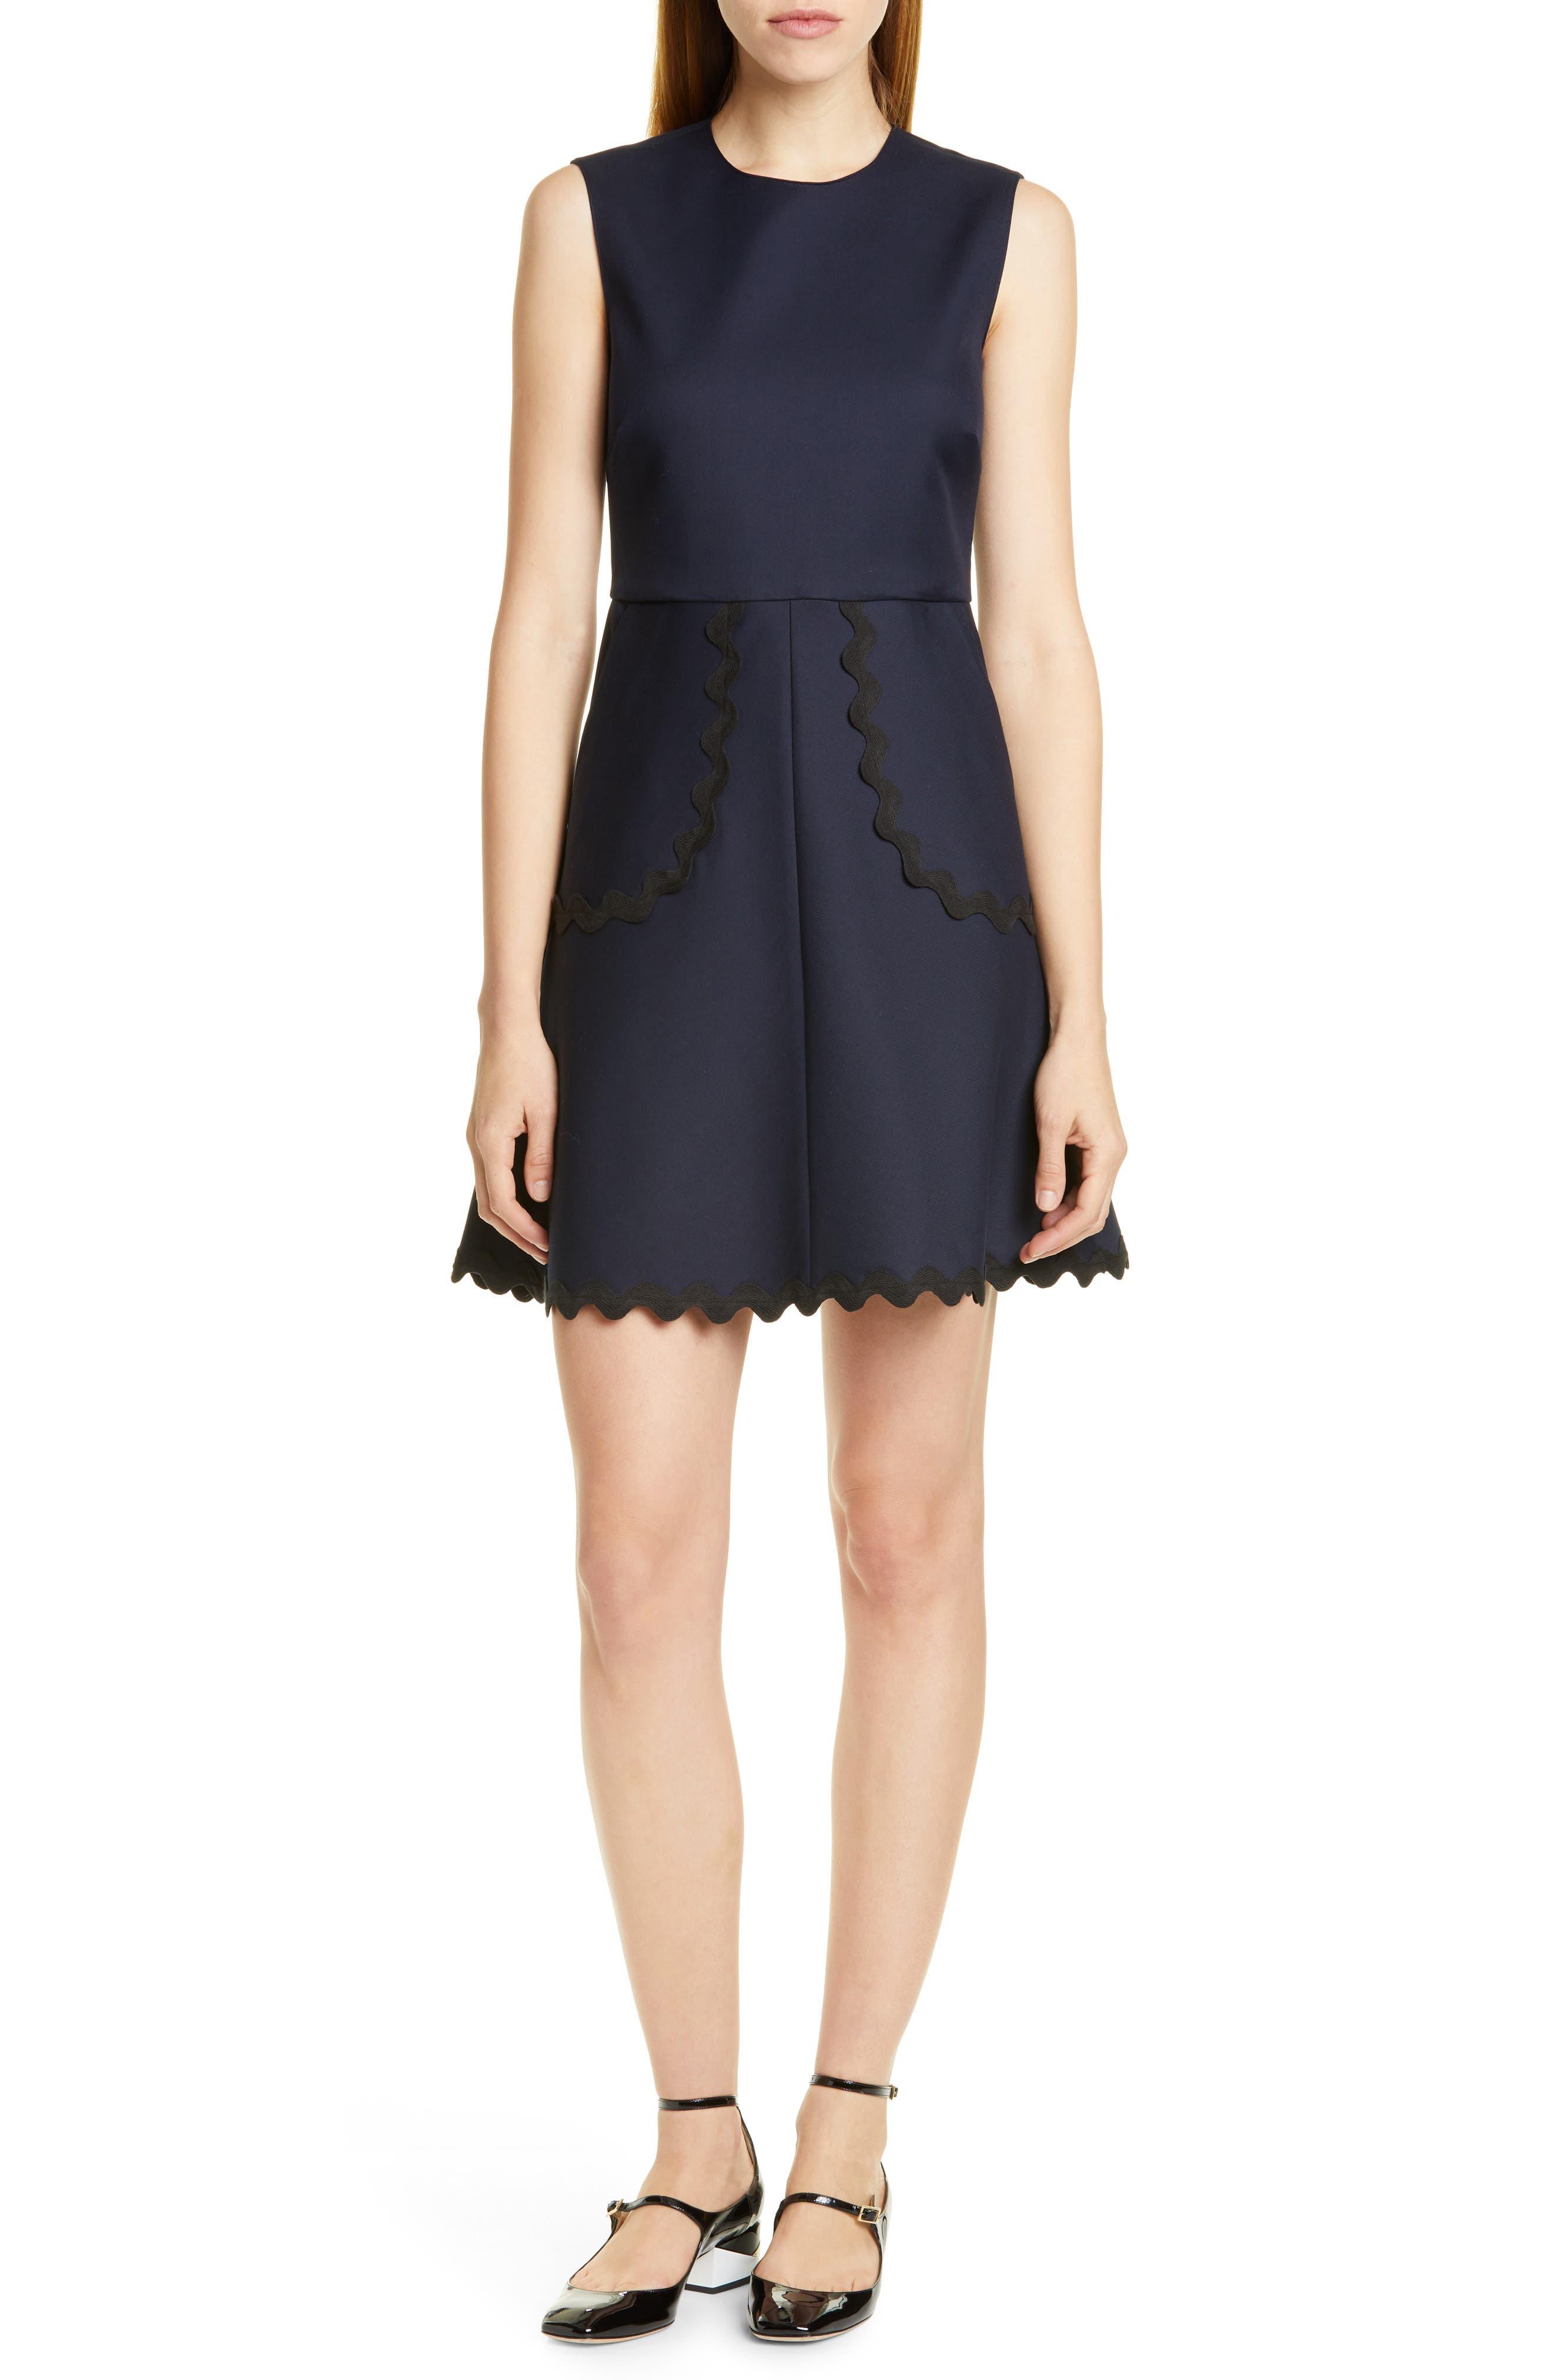 Red Valentino Rickrack Trim A-Line Minidress, 0 6IT - Blue